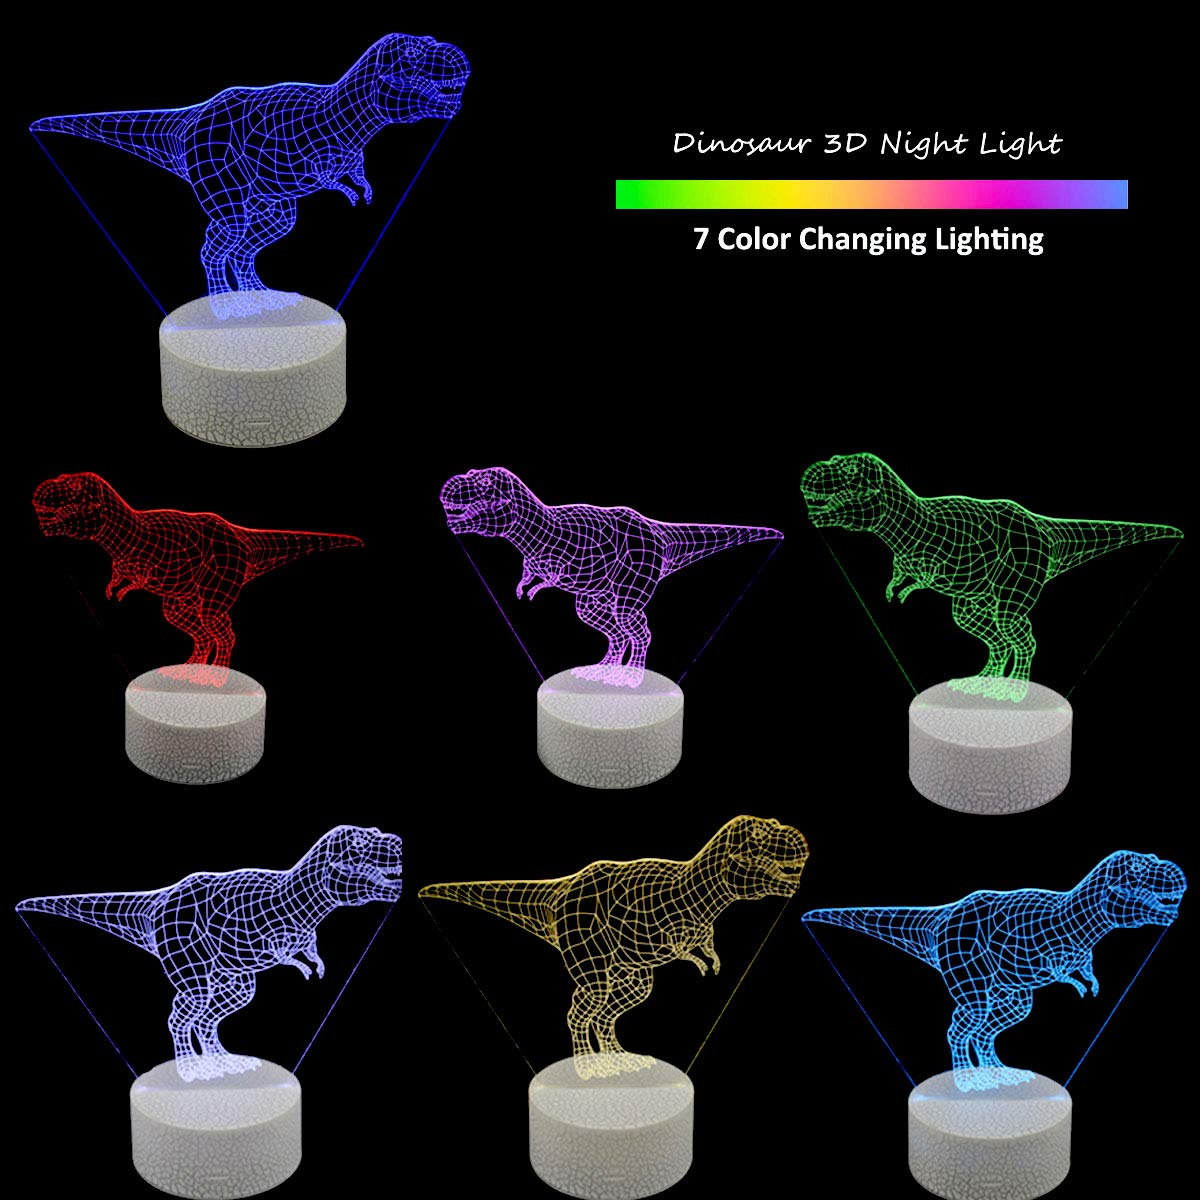 Dependable Skateboarding Sport Model 3d Nightlight Visual Illusion Led 7 Colors Changing Desk Light Luminous Bedroom Toys Toys & Hobbies